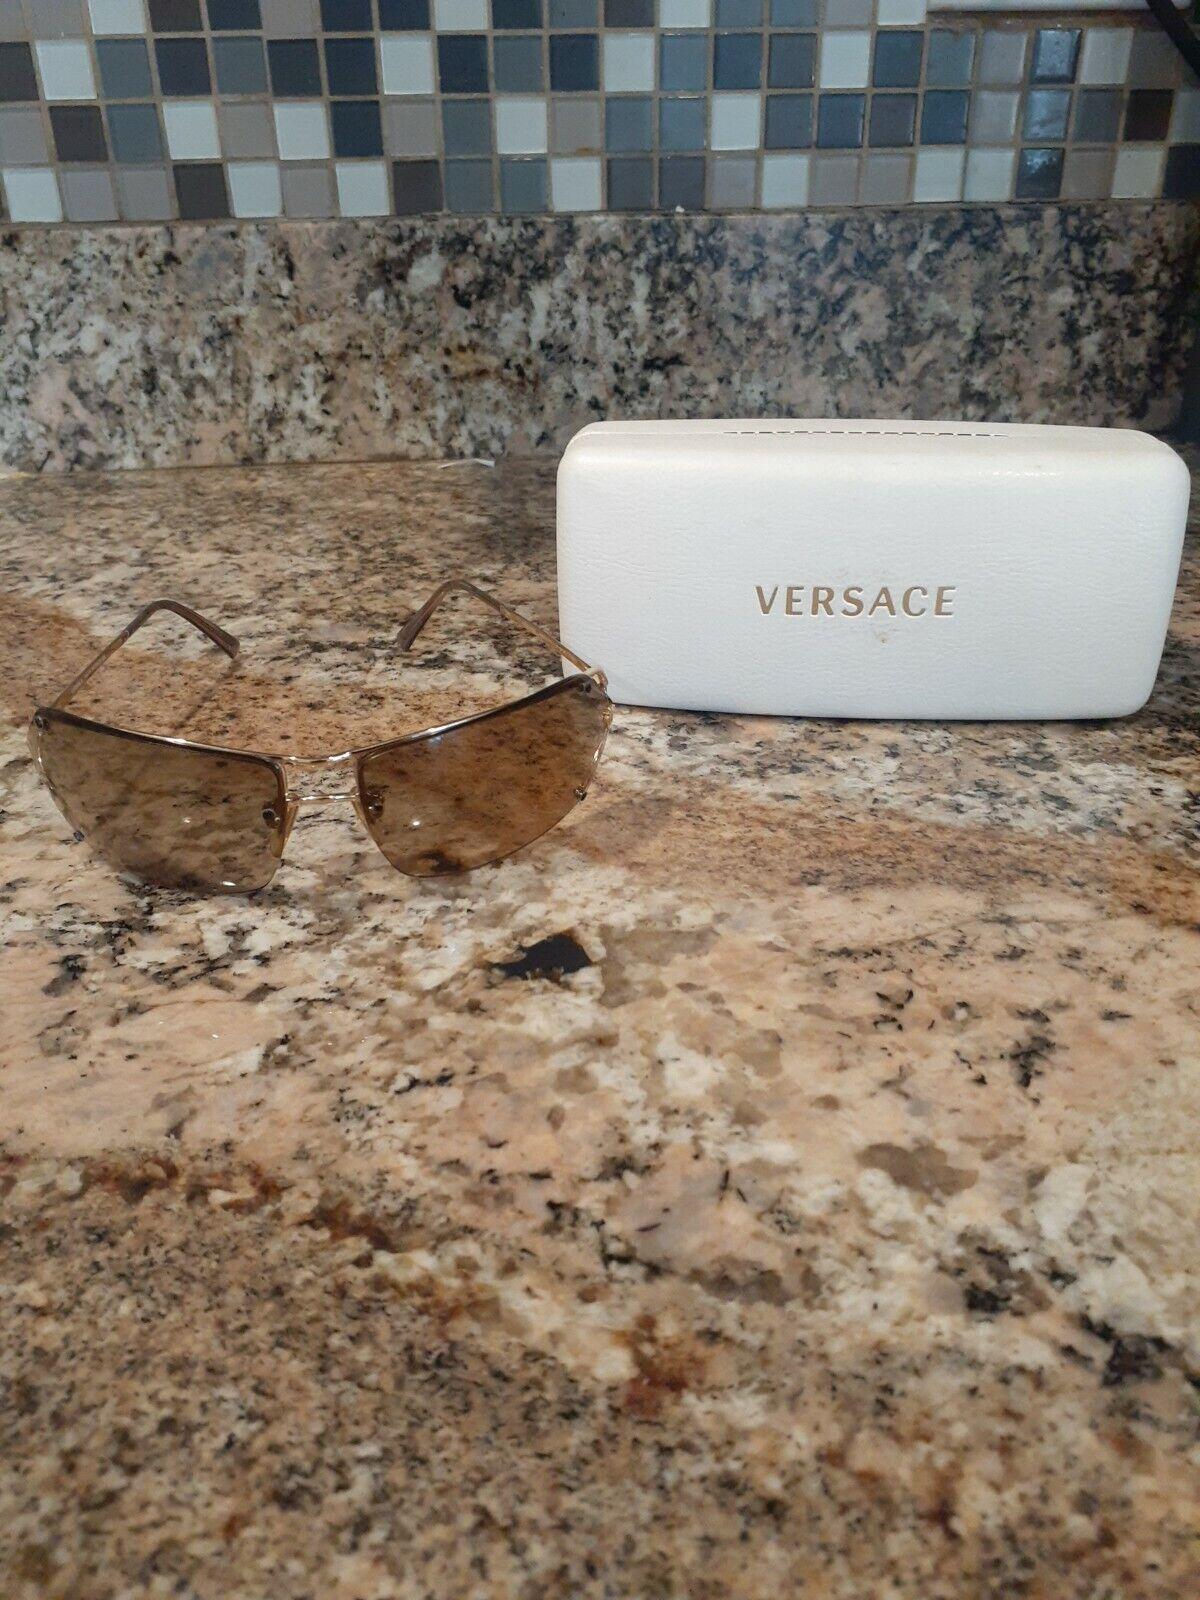 Vtg. Versace MOD N36 N30/577 71-14 115 tan lens Gold Tint Sunglasses with case